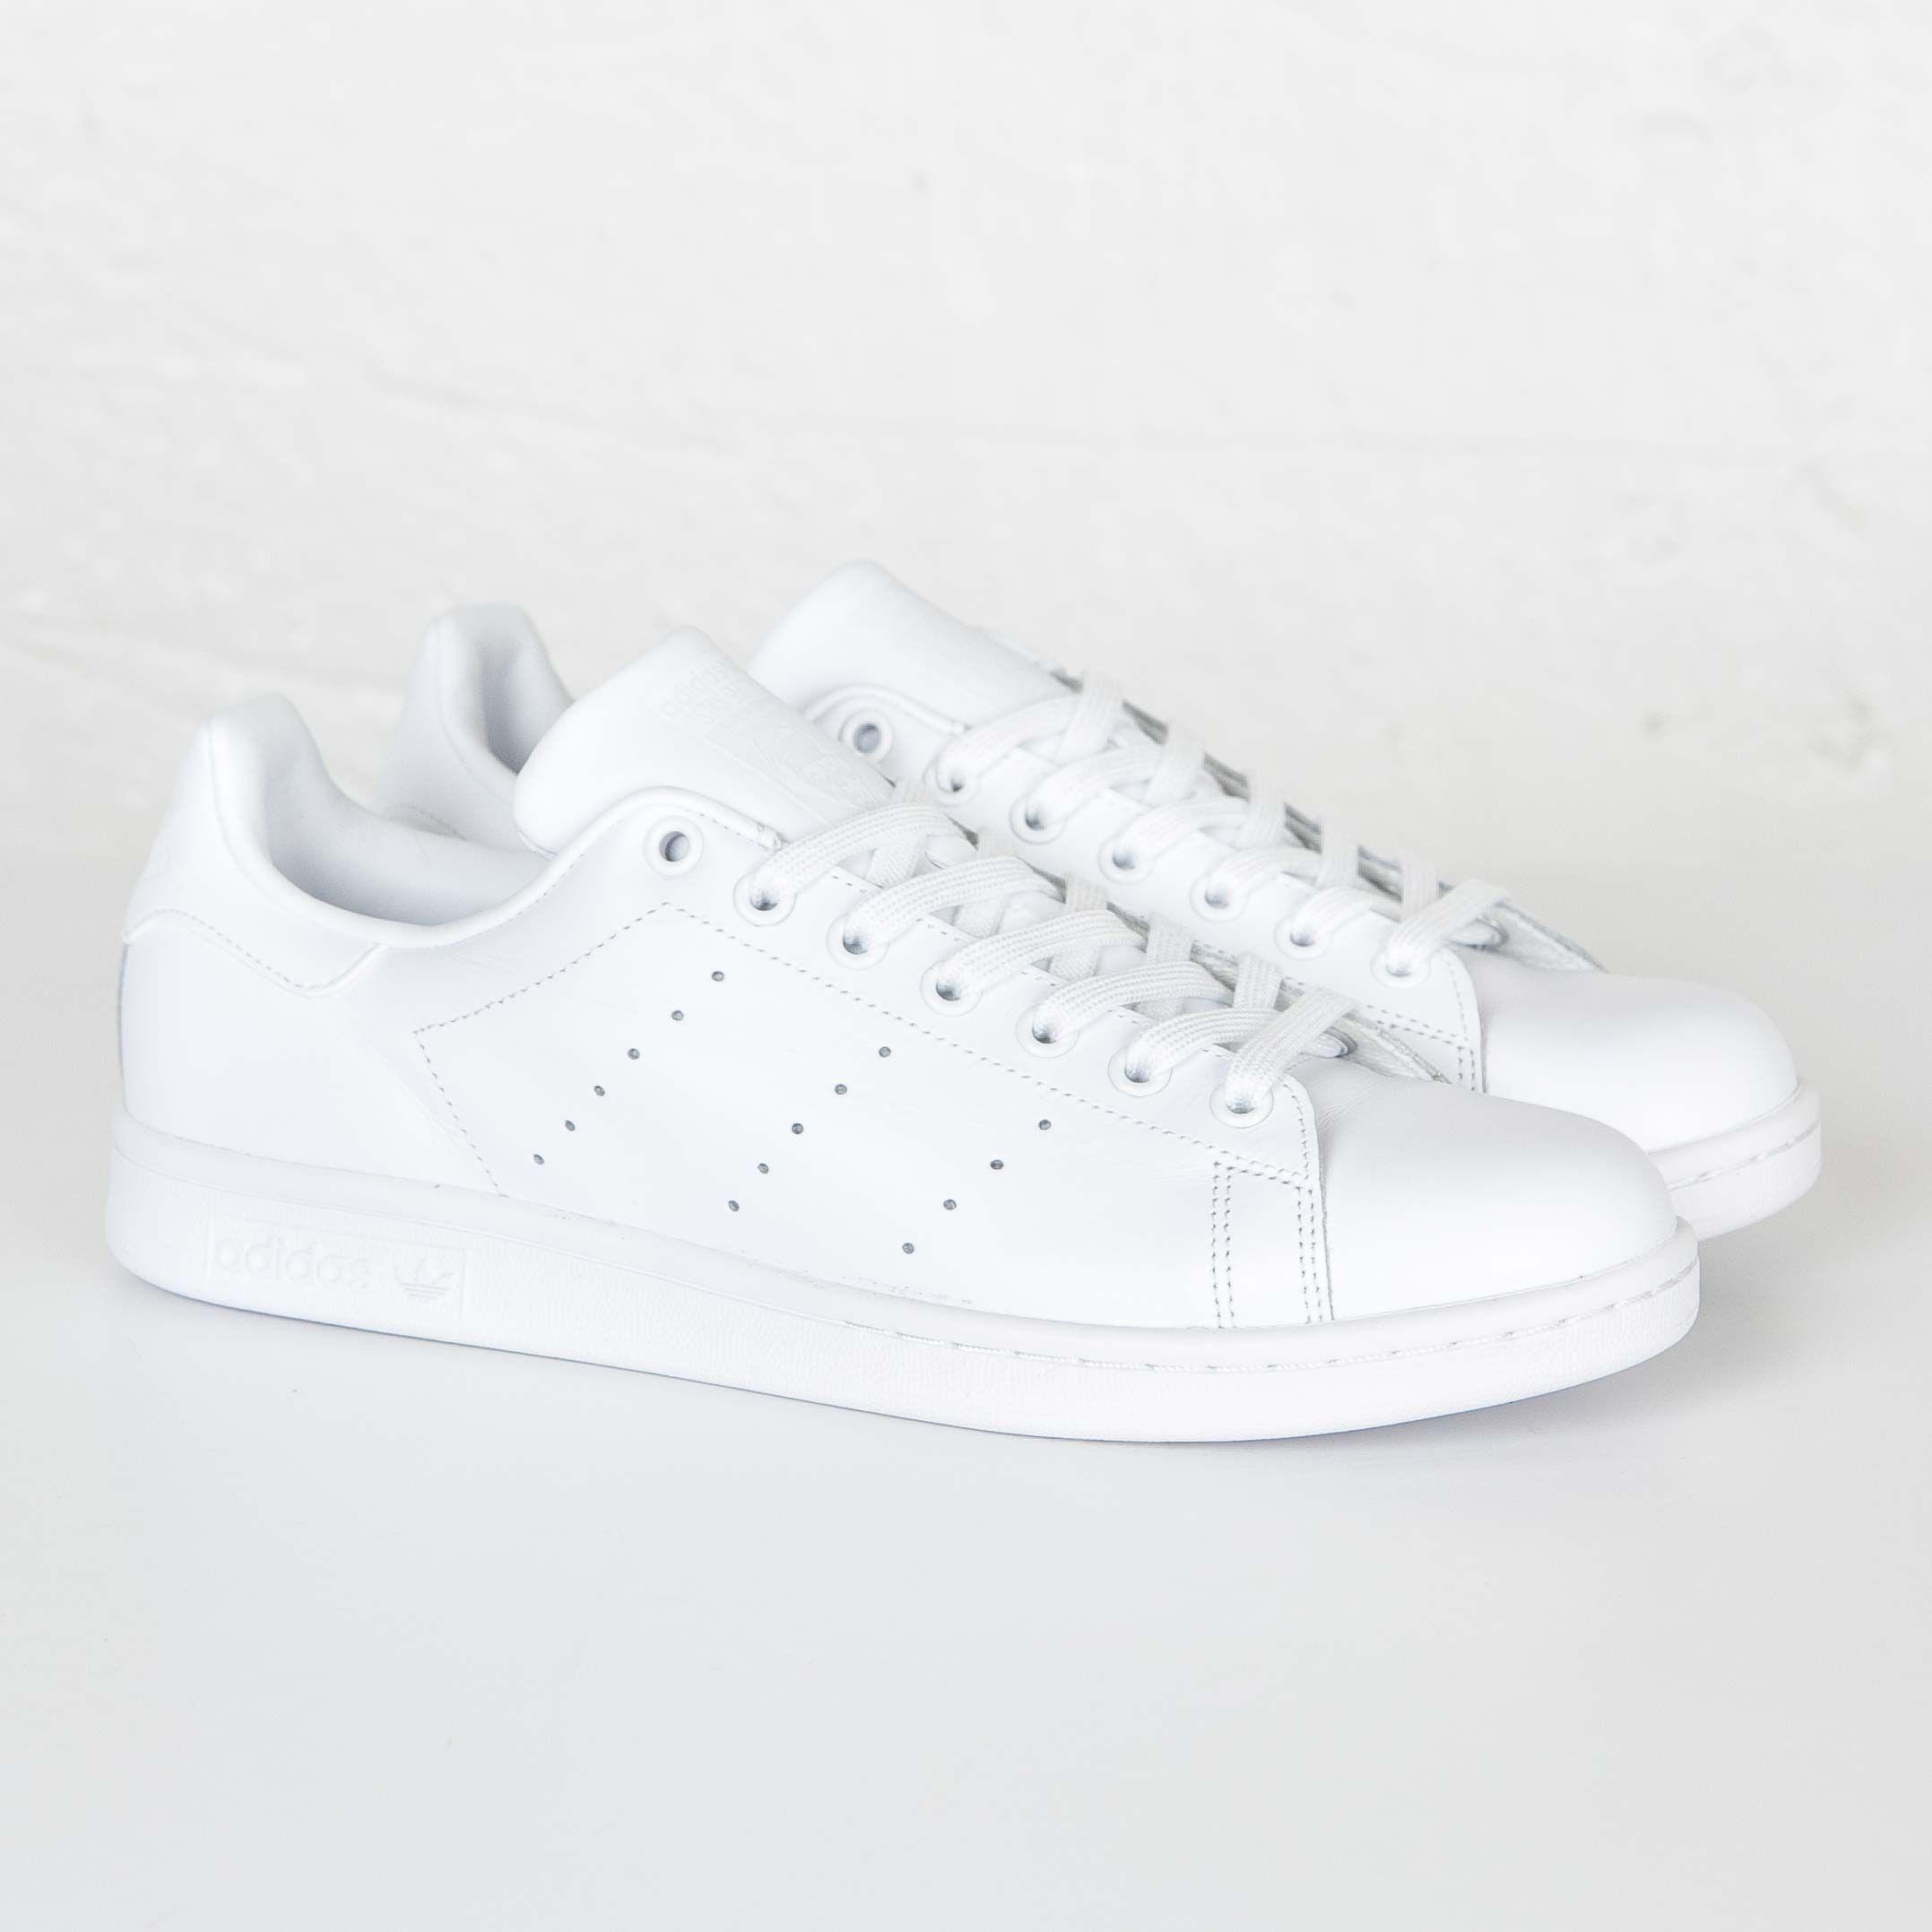 adidas Stan Smith. Adidas Stan Smith WhiteAdidas Stan Smith WomenStreetwear  OnlineAdidas NeoSneakers FashionStyle ...